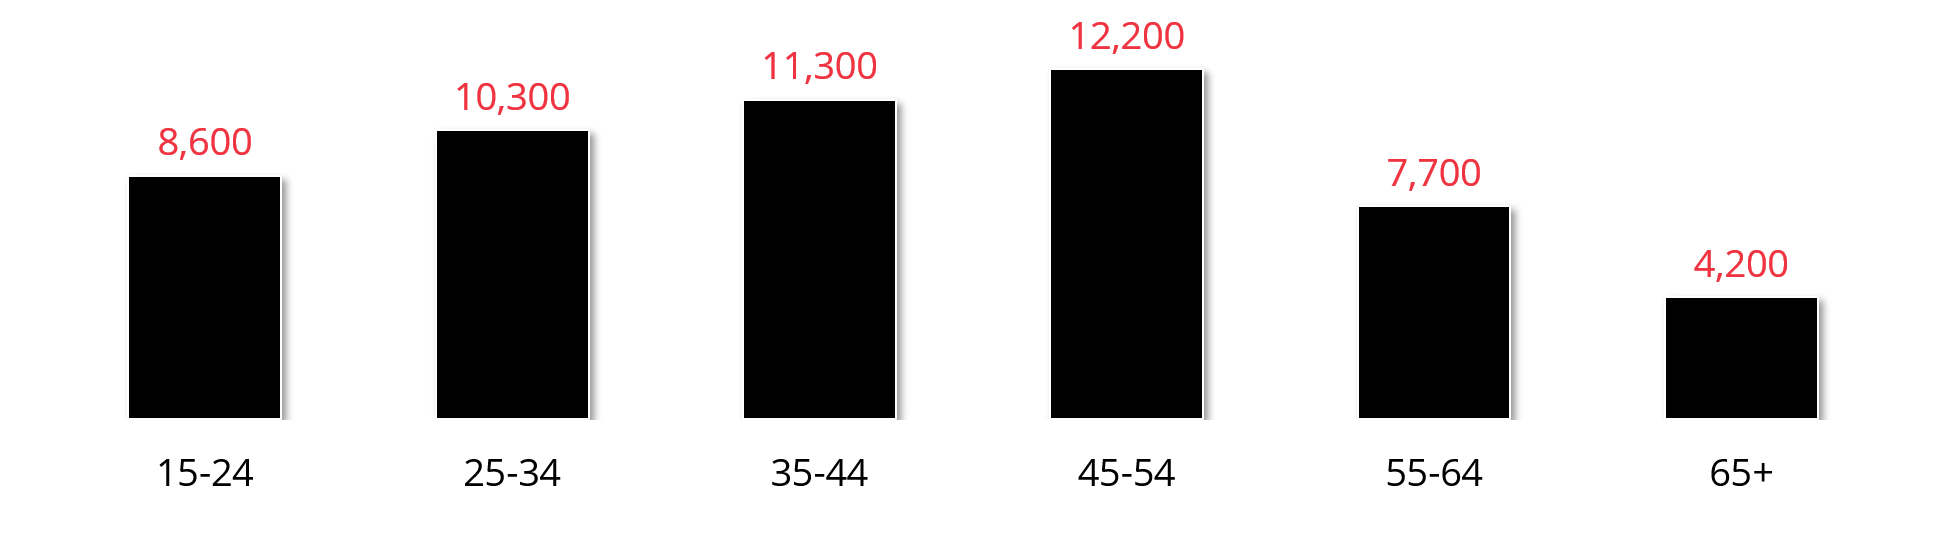 15-24: 8,600 | 25-34: 10,300 | 35-44: 11,300 | 45-54: 12,200 | 55-64: 7,700 | 65+: 4,200